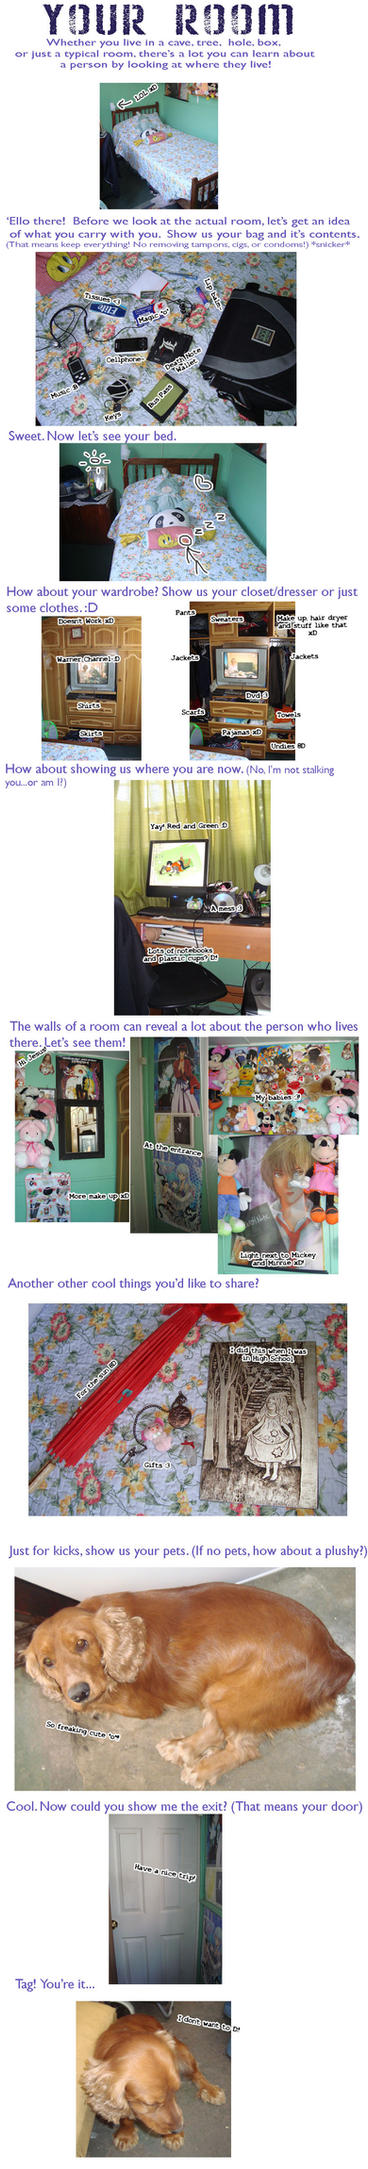 Room meme by MizaO-Chan